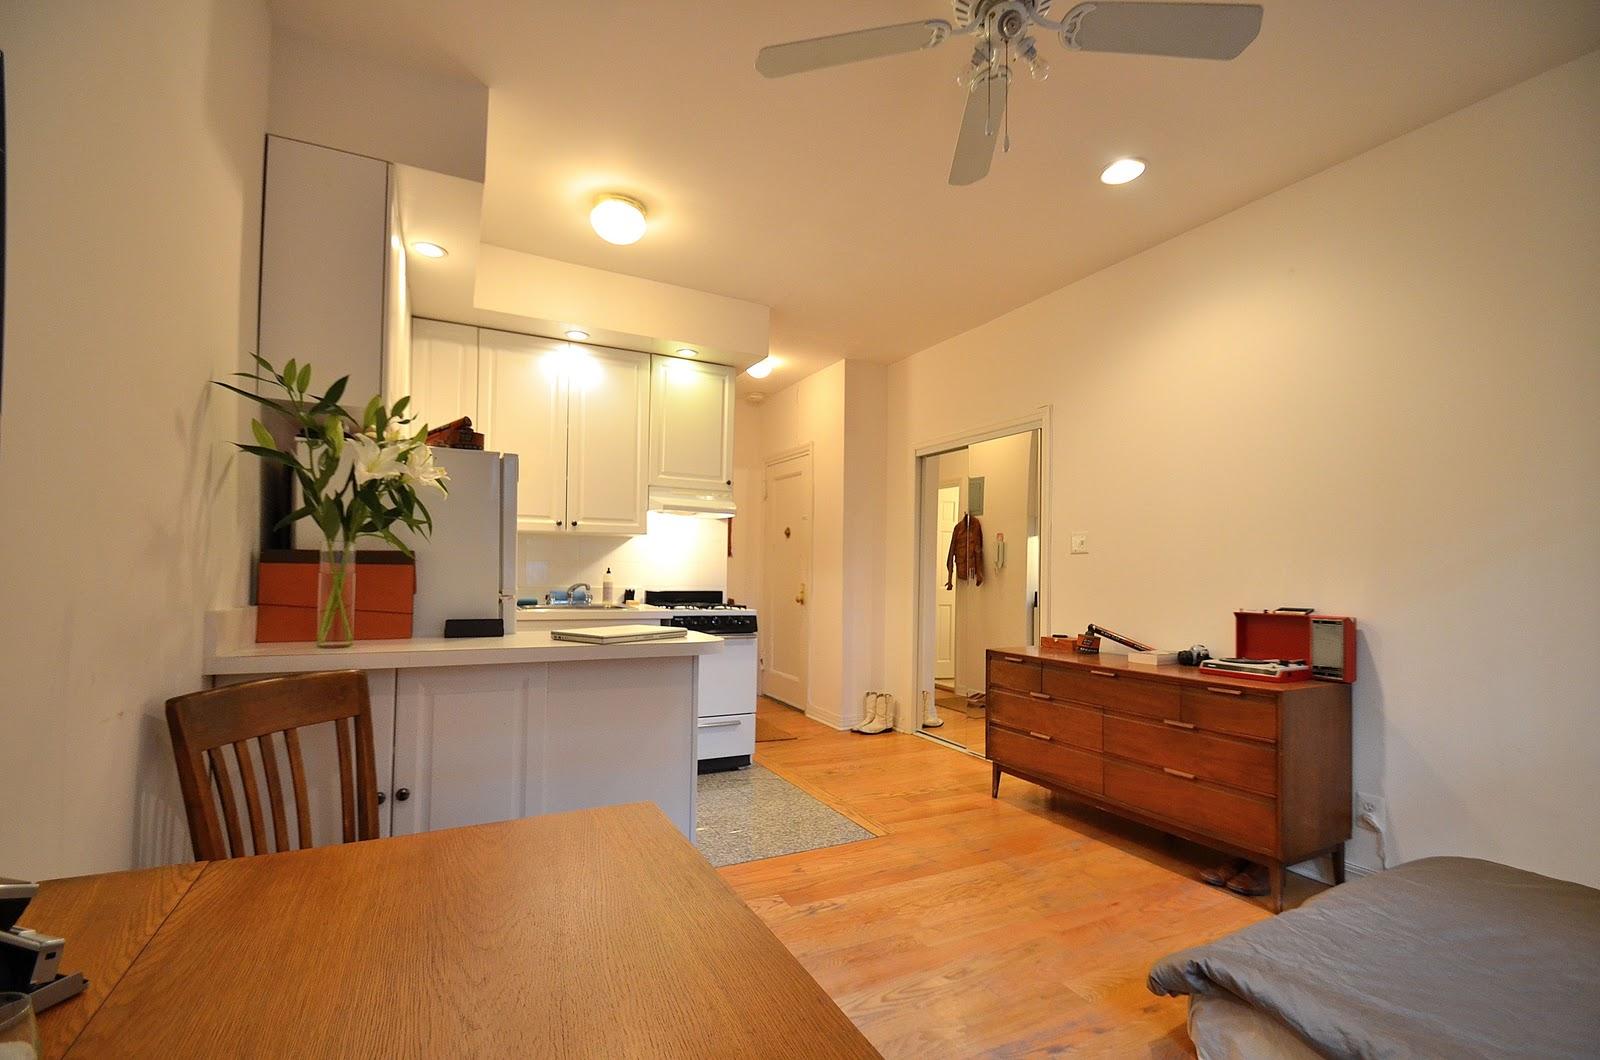 38 idea dekorasi dapur untuk apartment dan kondominium yang kecil dan comel - New apartment decorating ...